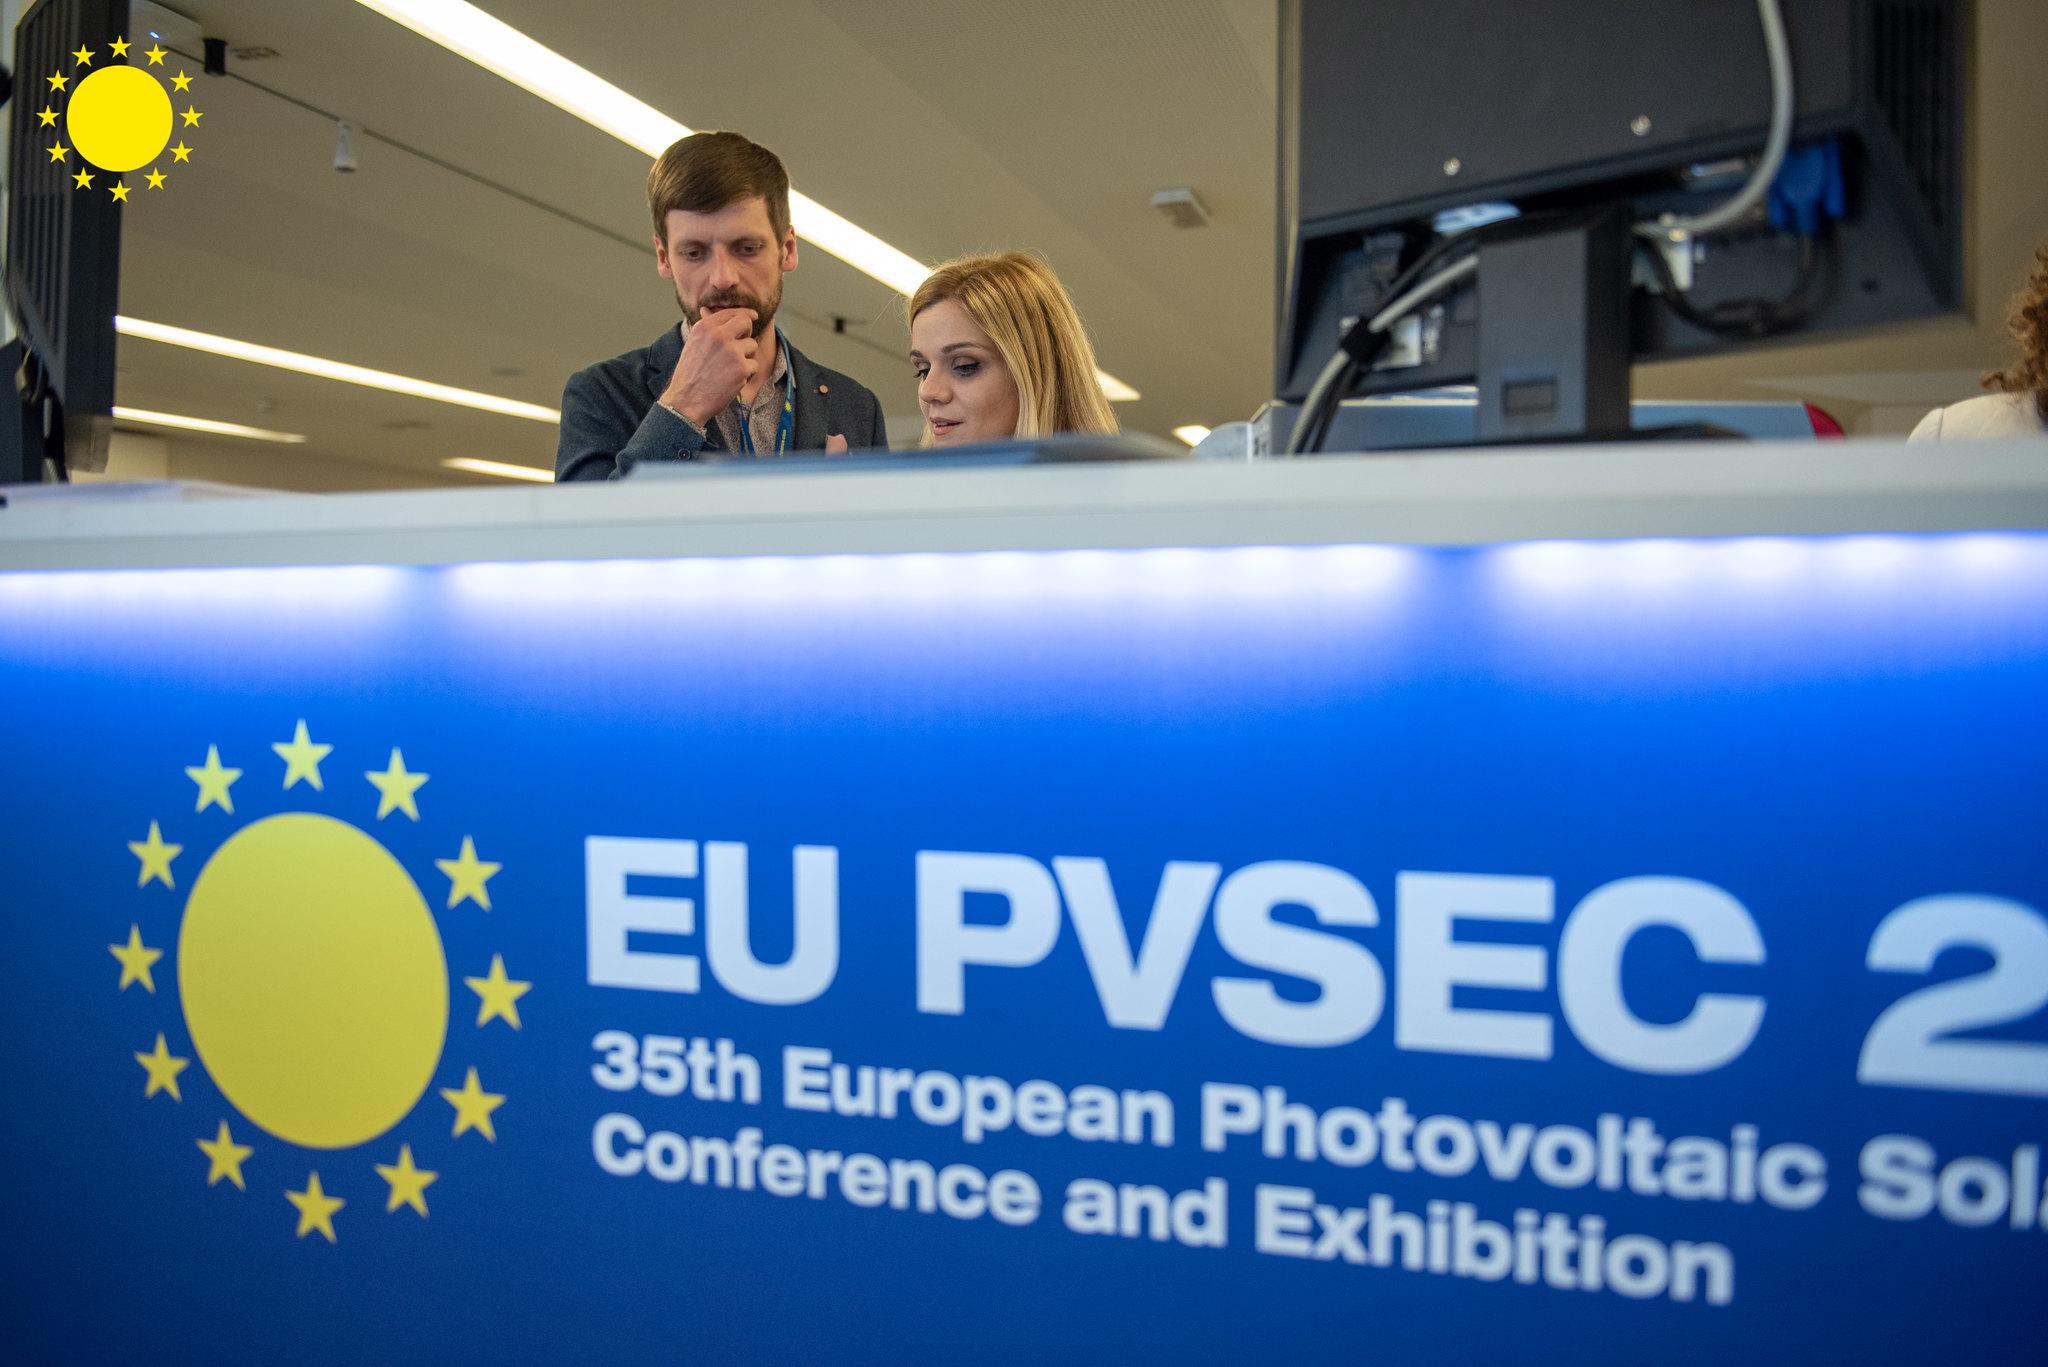 EU PVSEC – 37th European Photovoltaic Solar Energy Conference and Exhibition